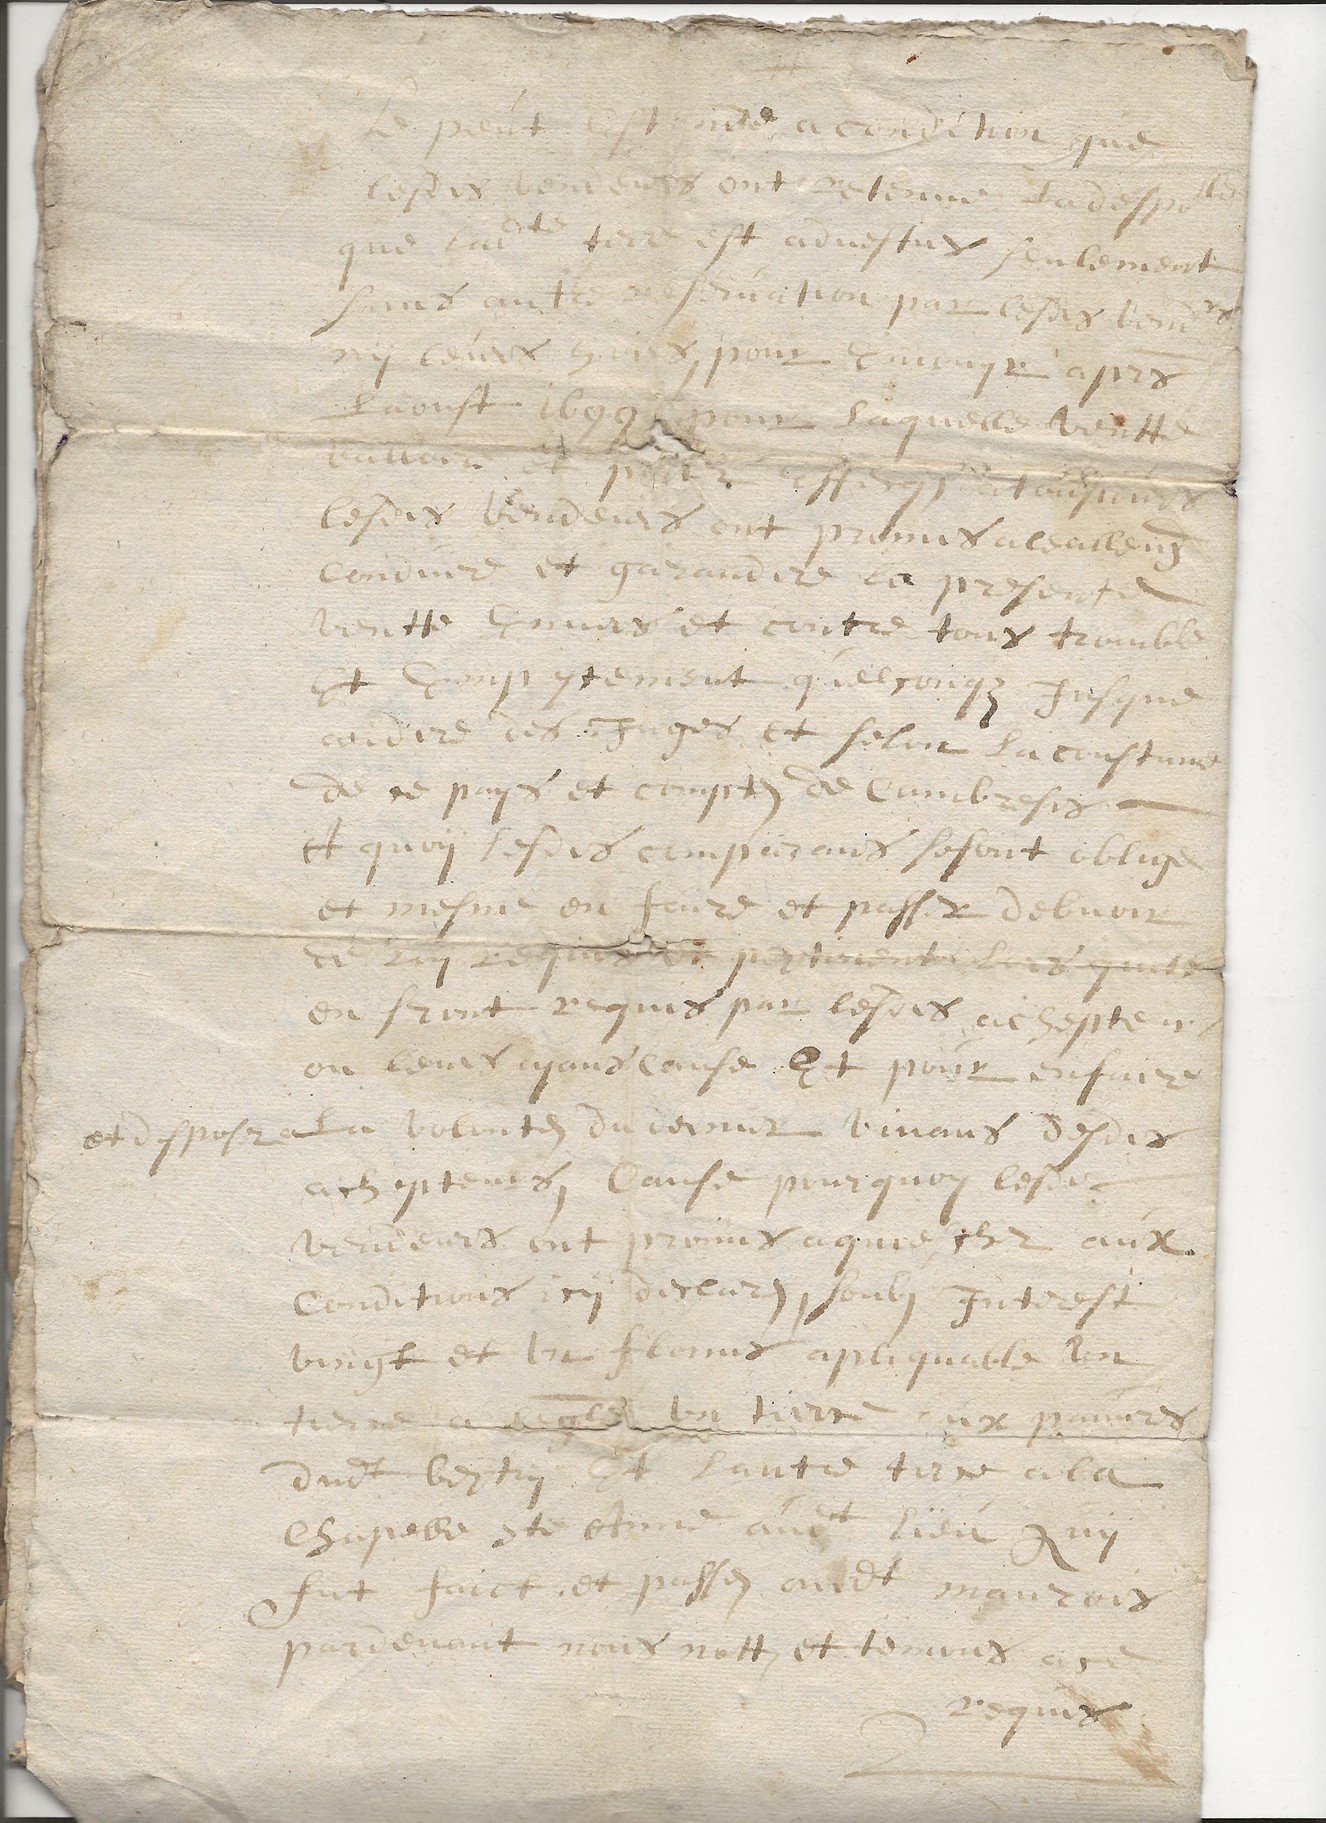 1697 acte concernant jean pruvot 5